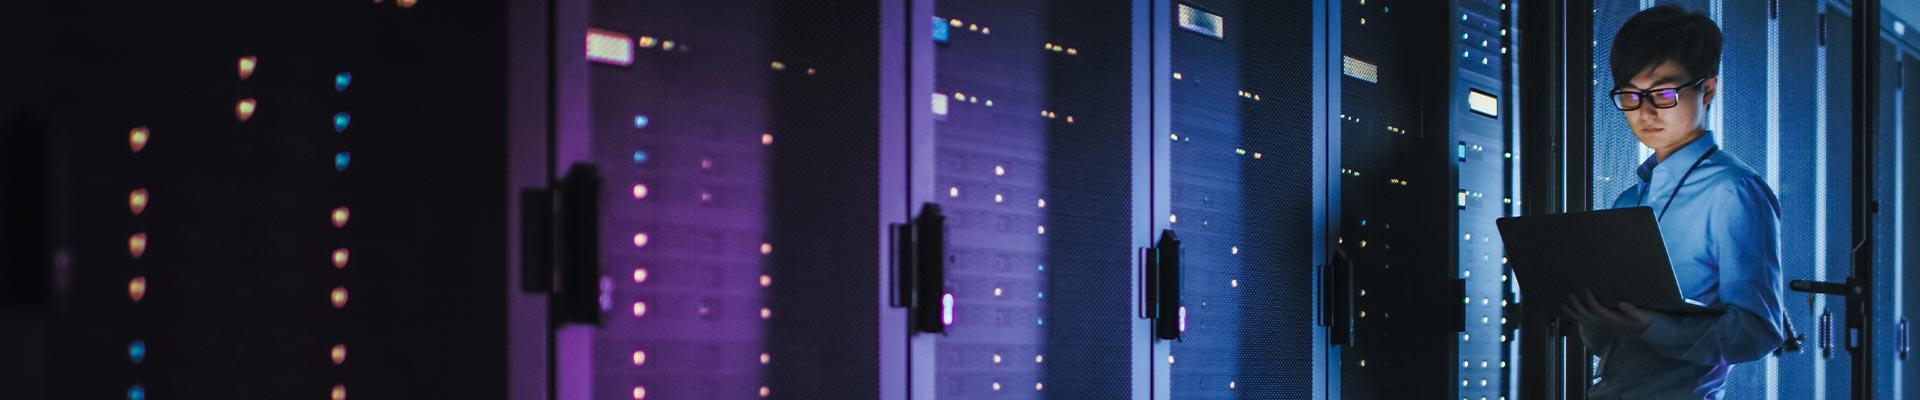 Hybrid Cloud – Data Centre Extend